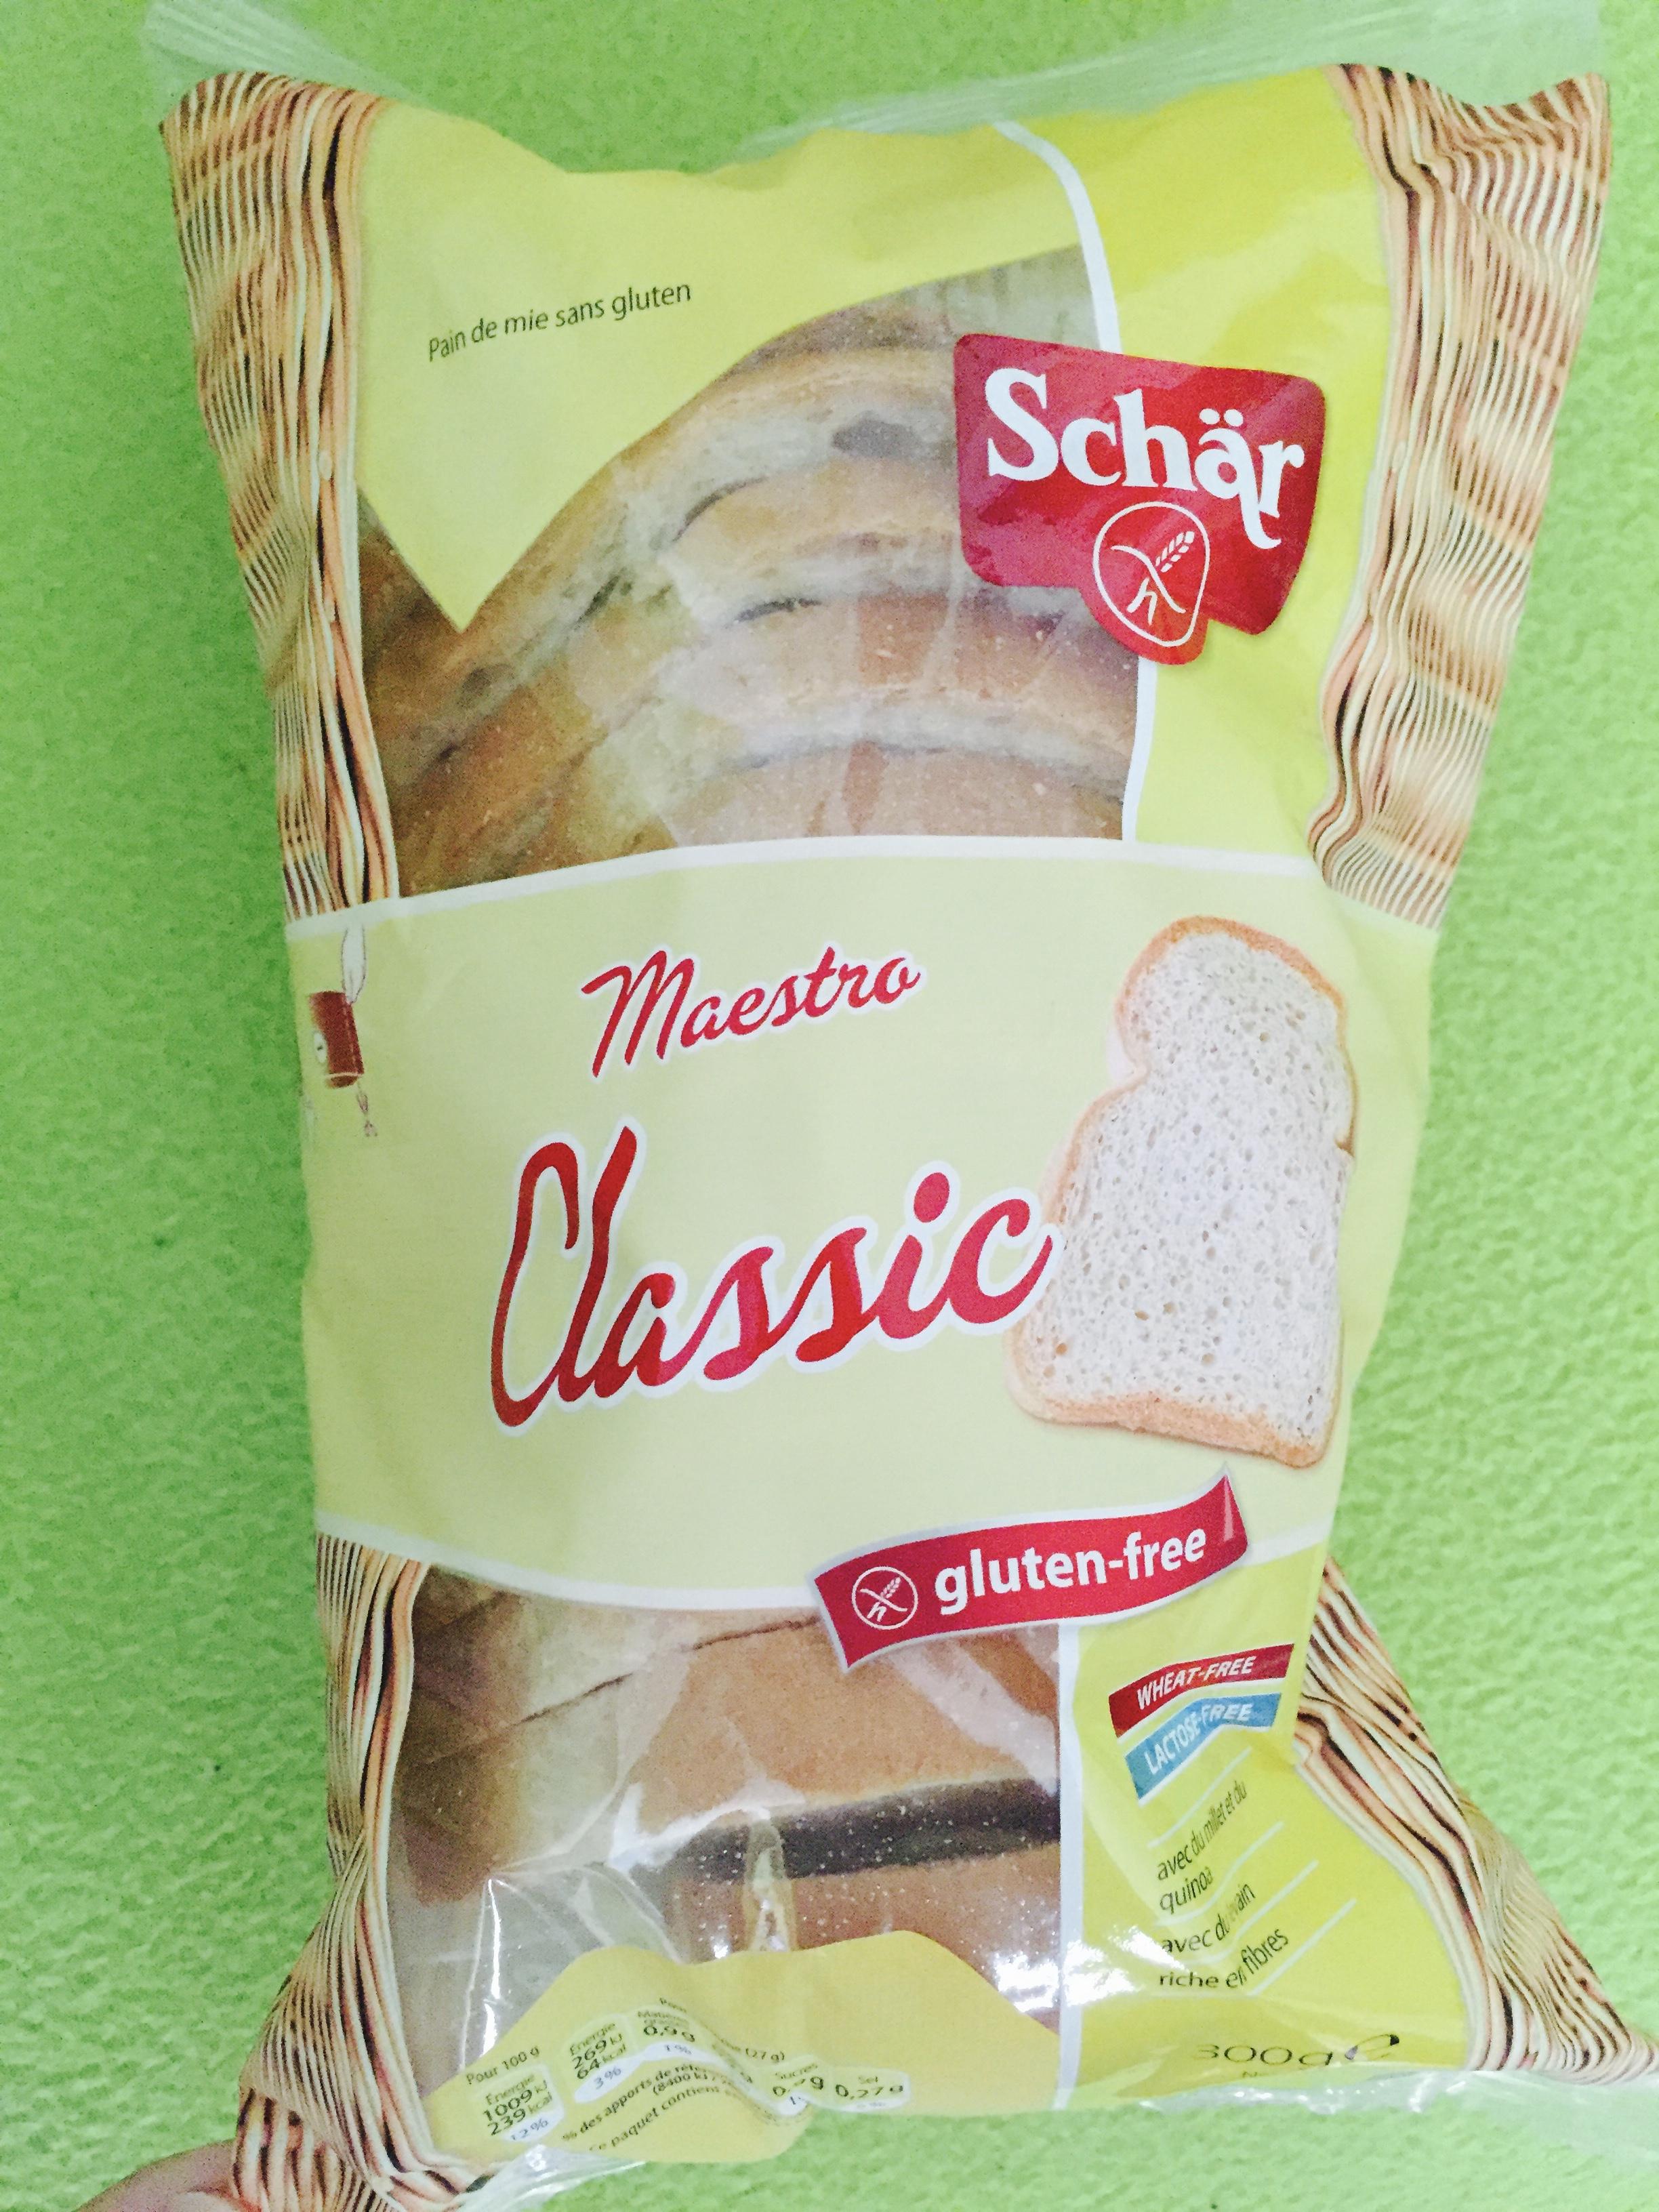 http://www.assorti.lt/meistru-kepeju-duona-classic-schar-300g